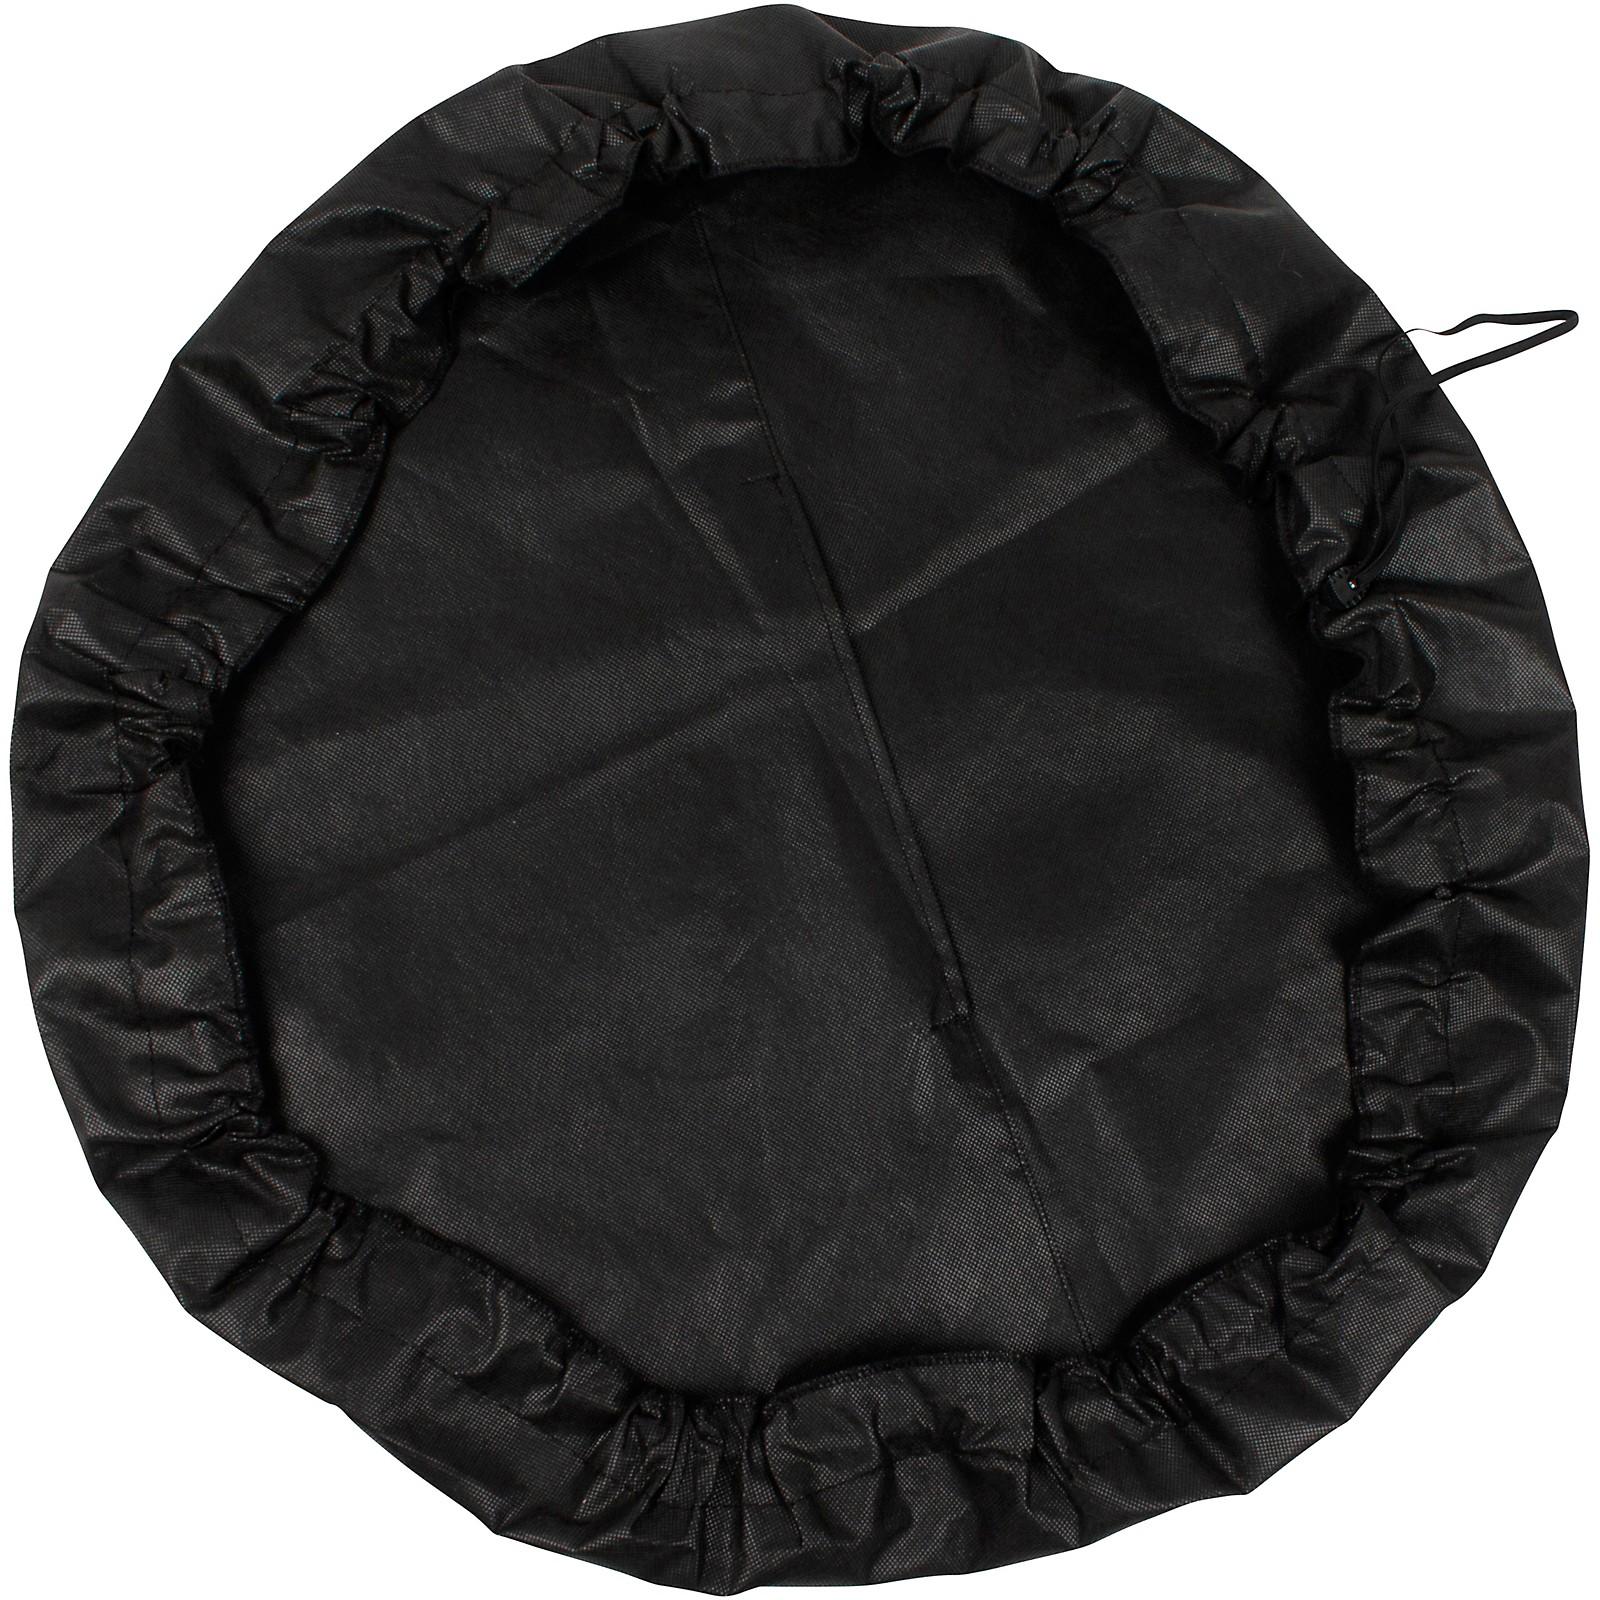 Gator Black Bell Mask With MERV-13 Filter, 27-29